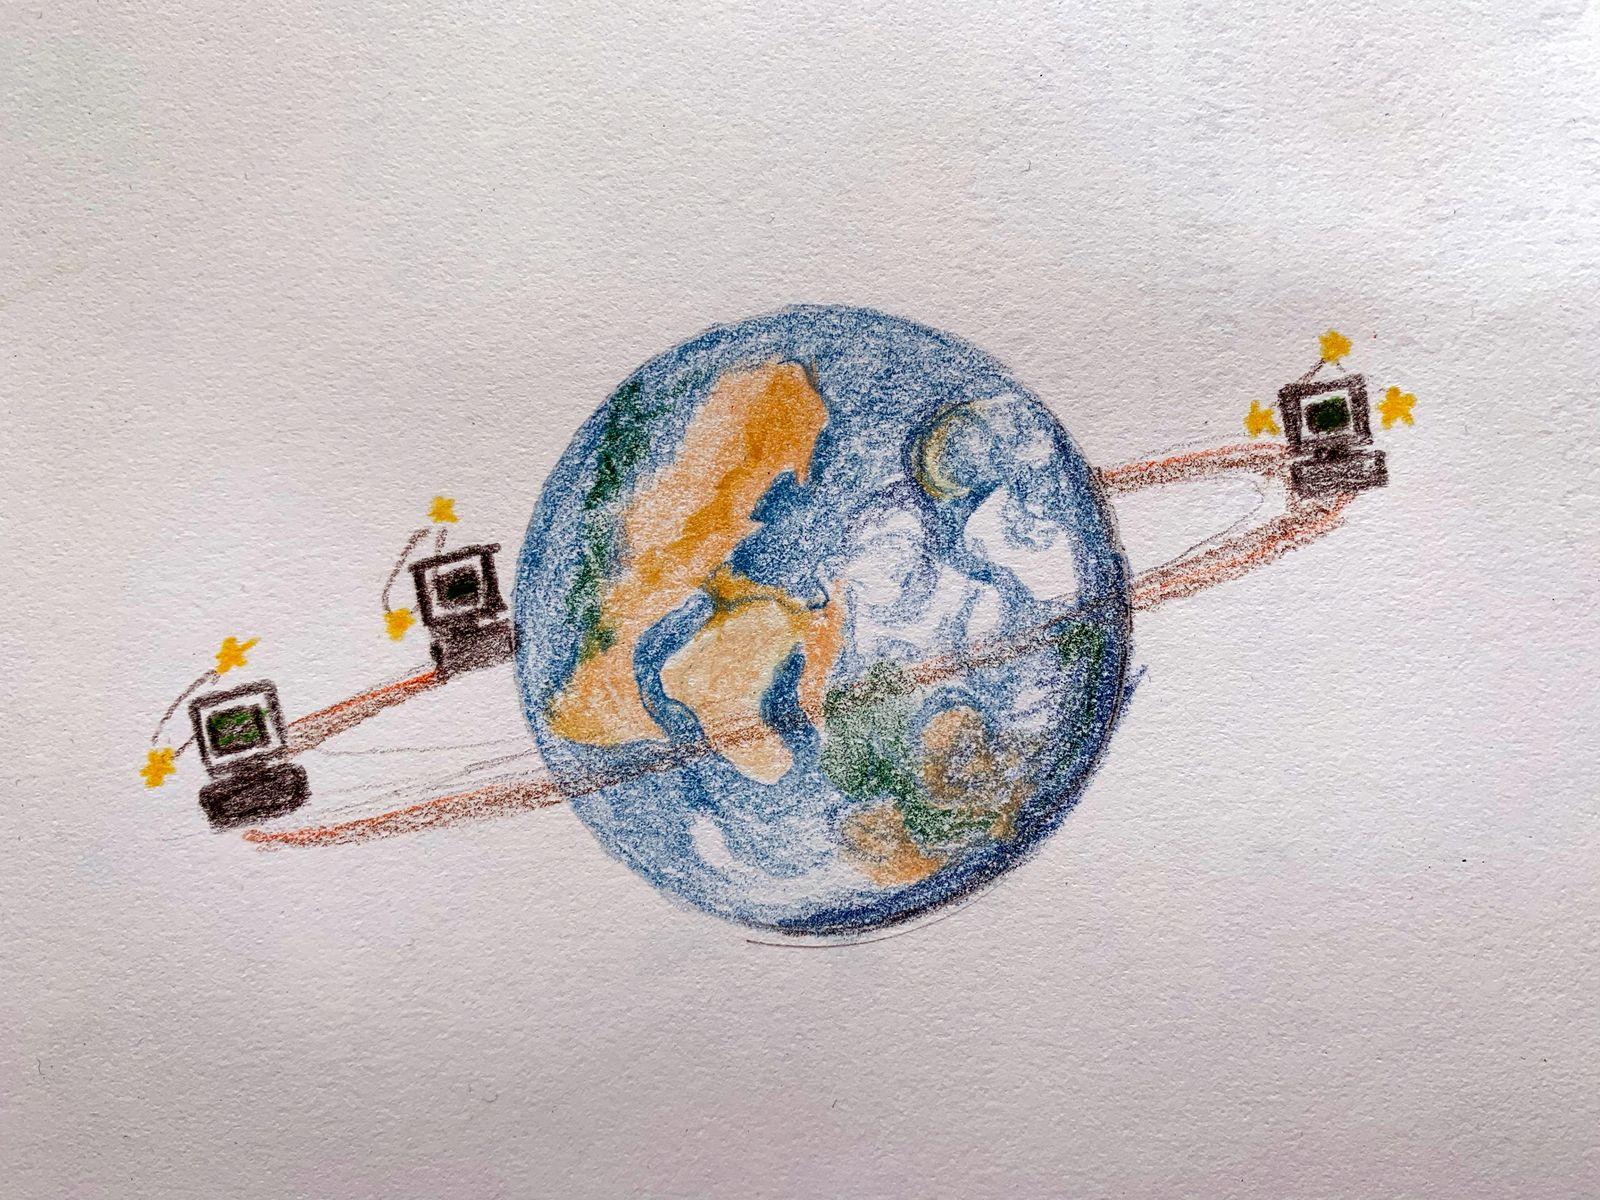 A globe with three computers orbiting around it